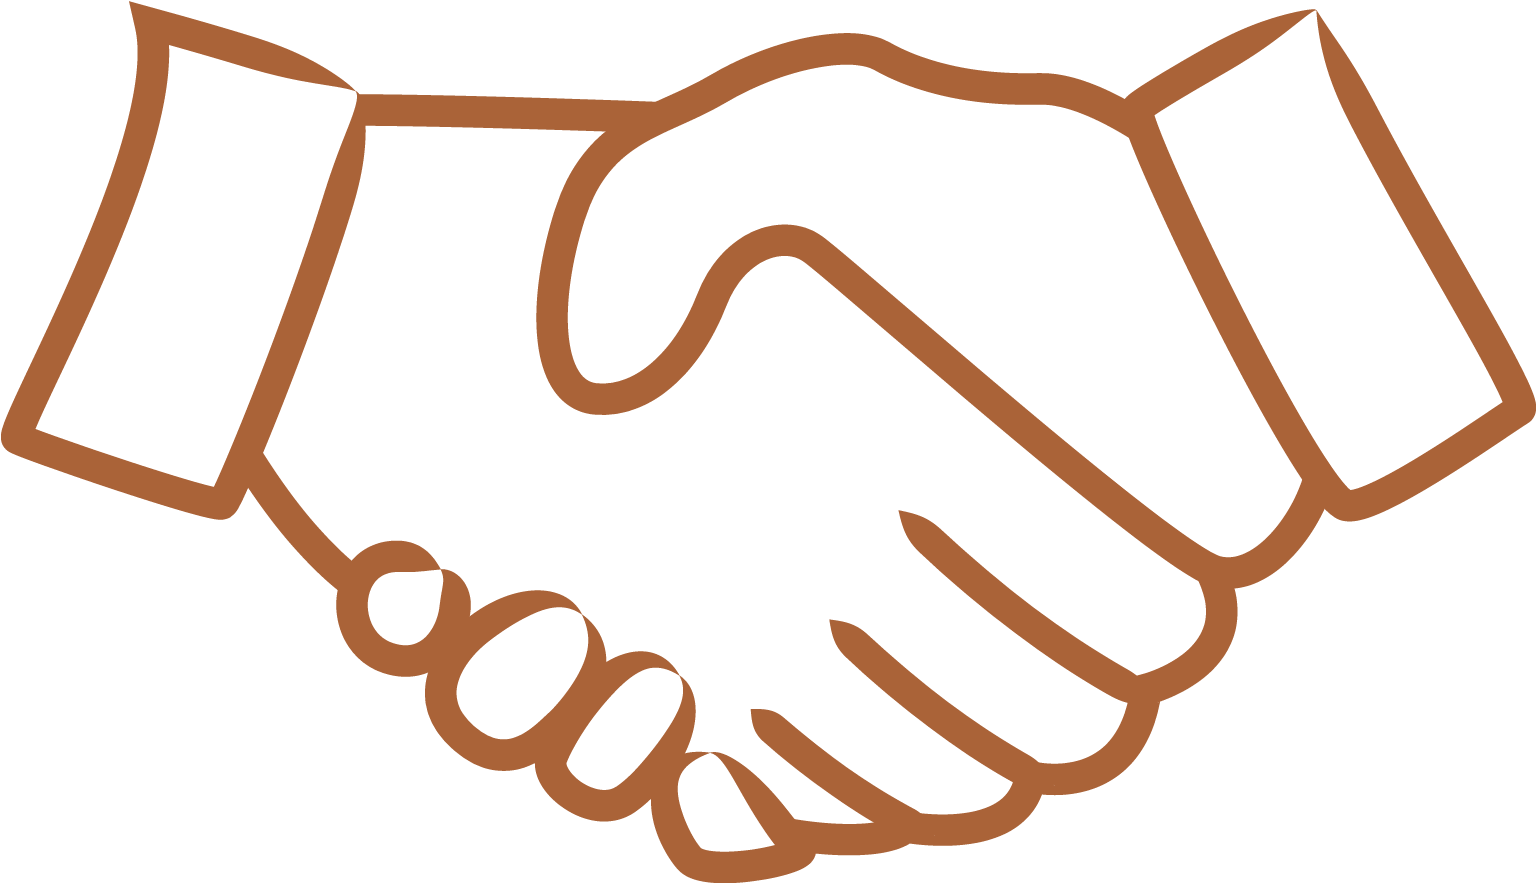 Handshake Clipart Executive Agreement , Transparent Cartoon.